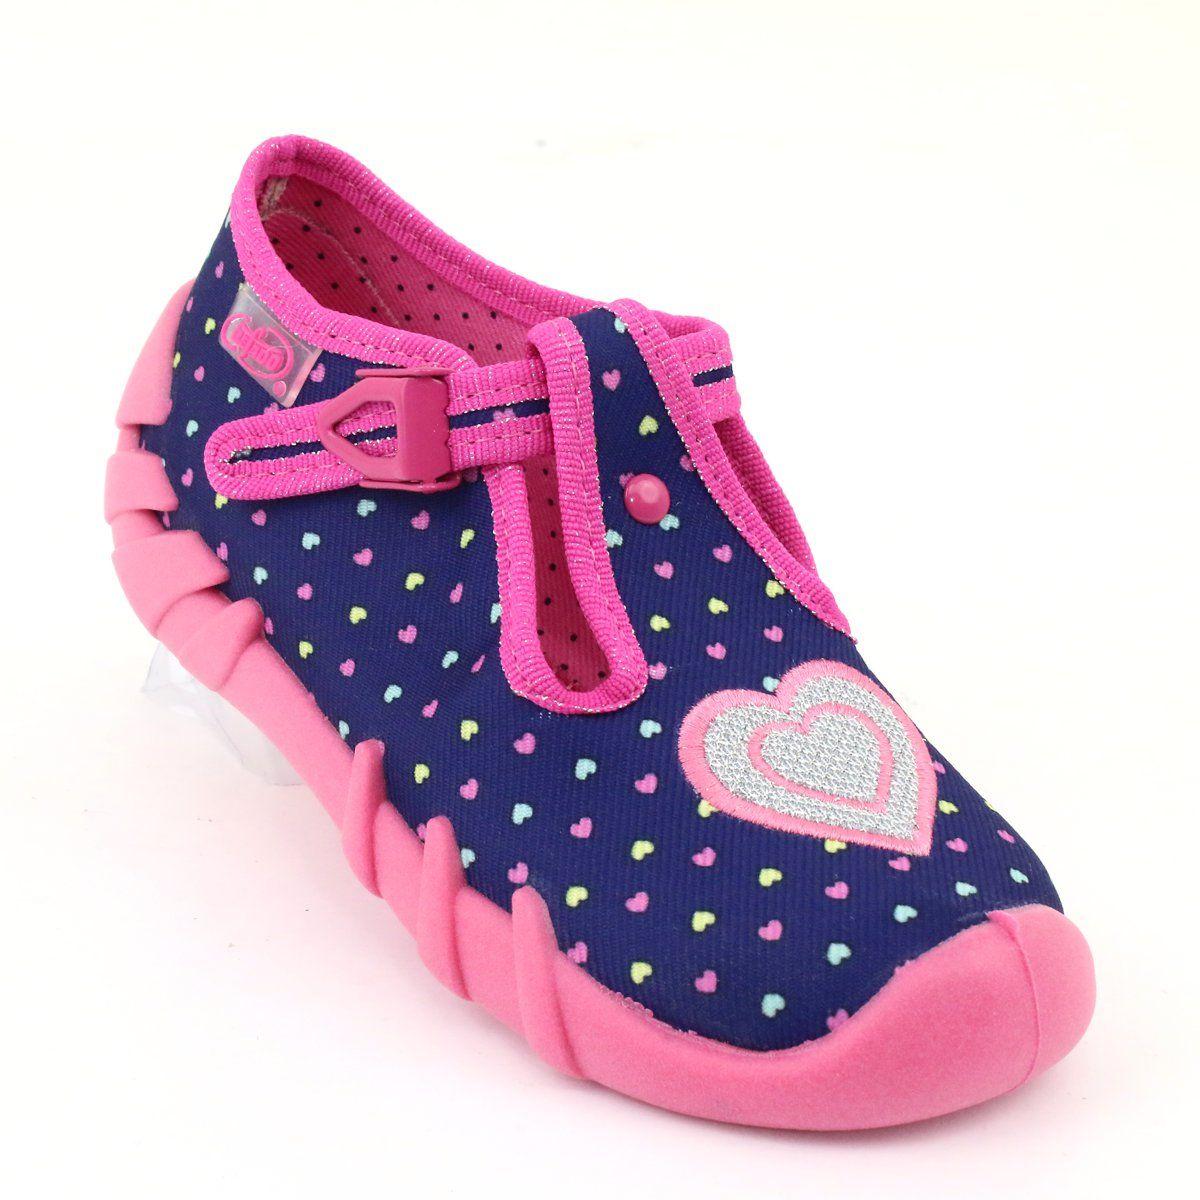 Befado Obuwie Dzieciece 110p362 Granatowe In 2020 Baby Shoes Shoes Fashion